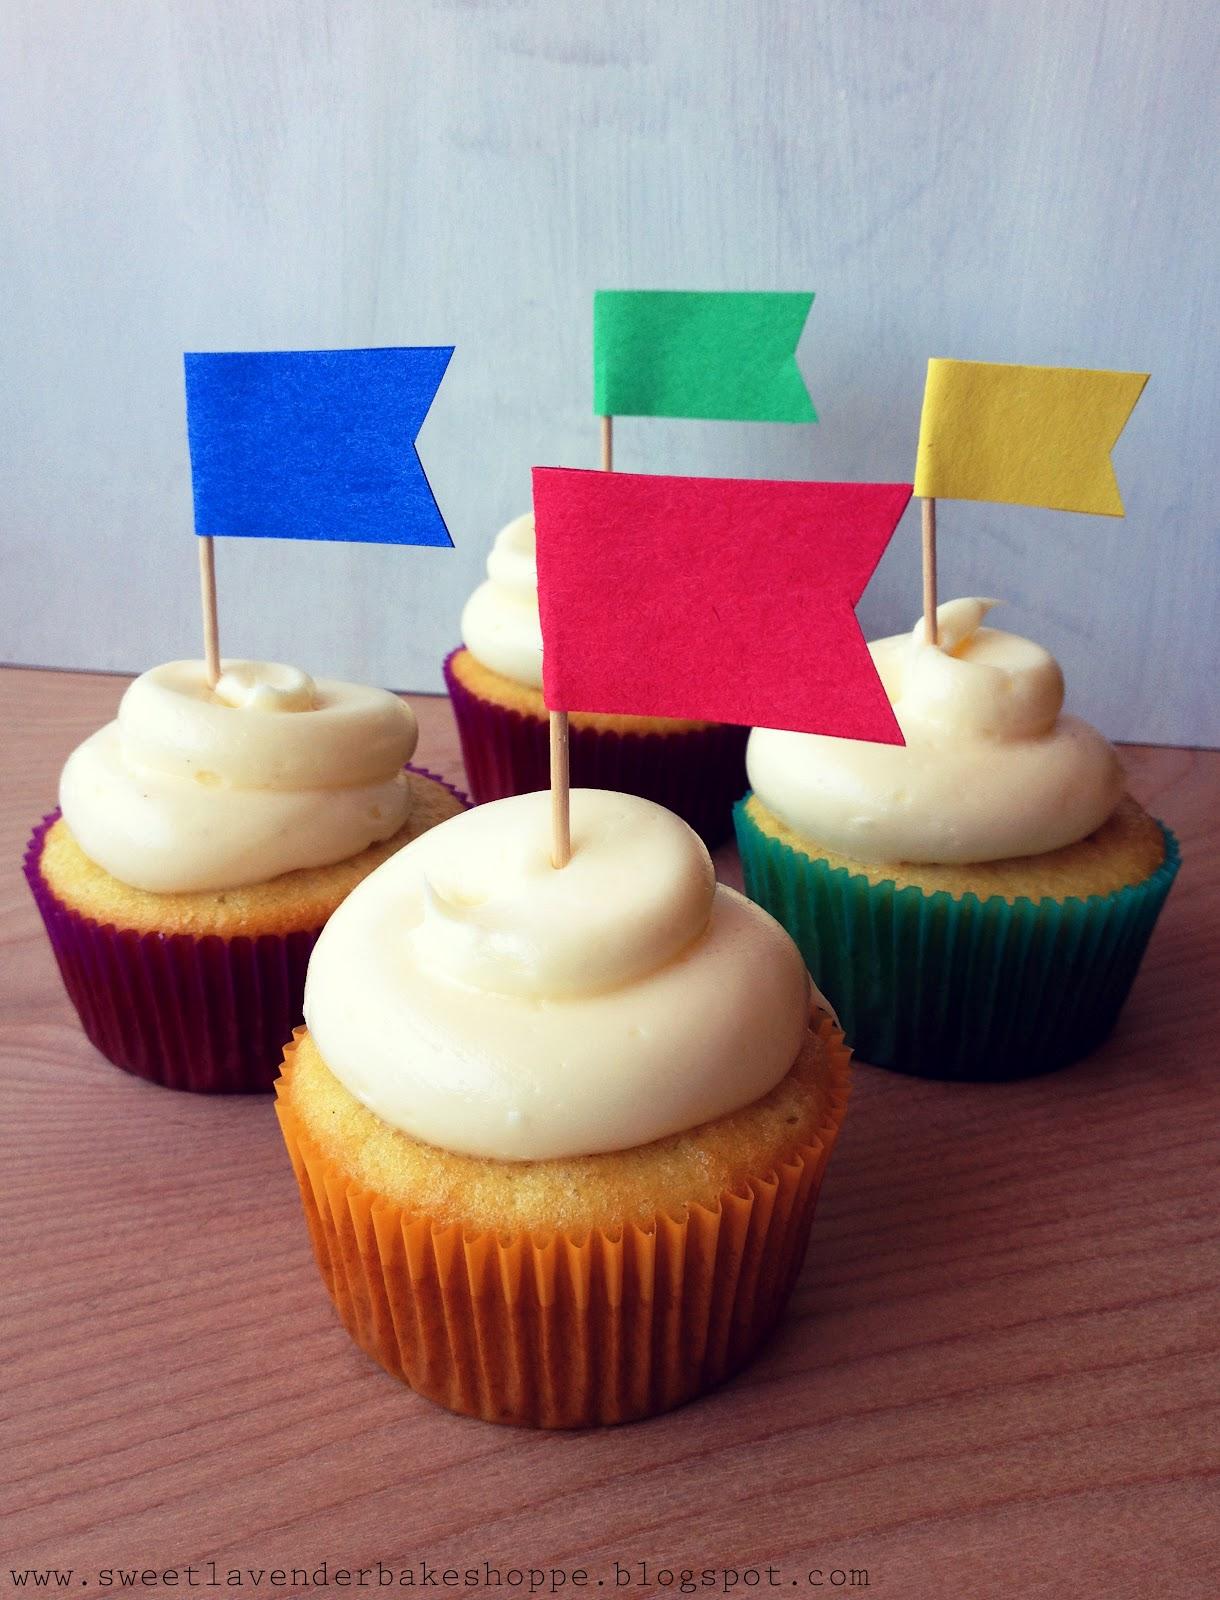 Sweet Lavender Bake Shoppe: diy flag cupcake toppers